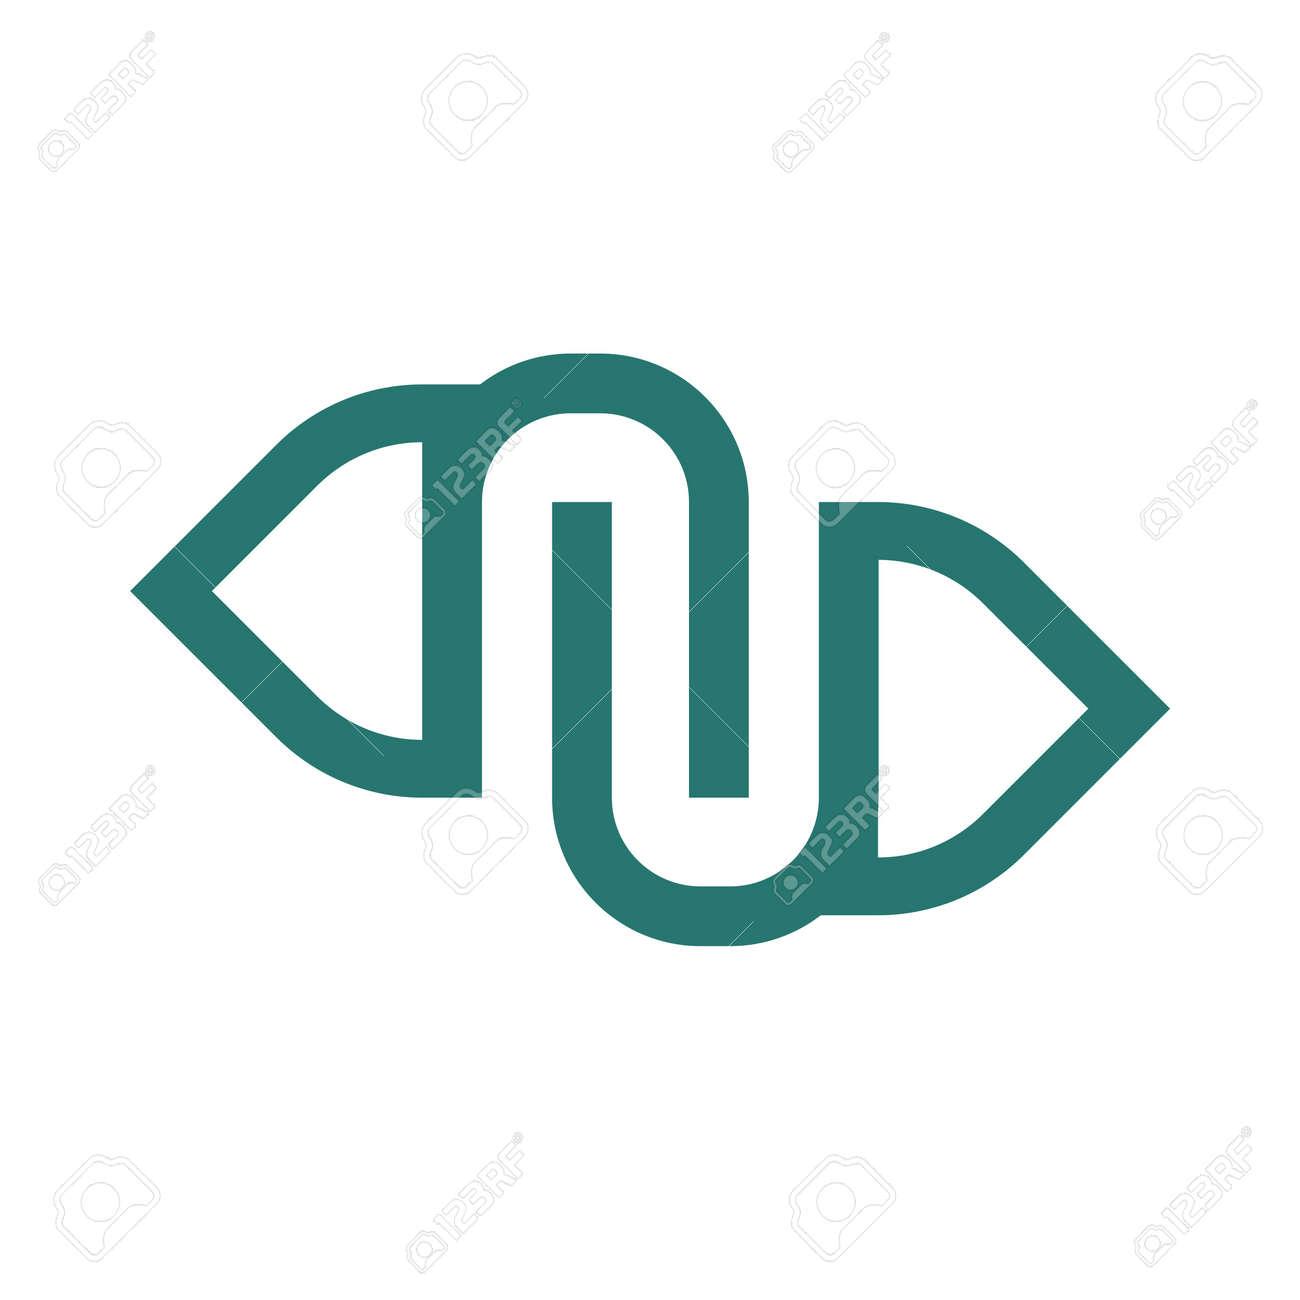 Logo design company name letter n symbol icon royalty free logo design company name letter n symbol icon stock vector 45283493 buycottarizona